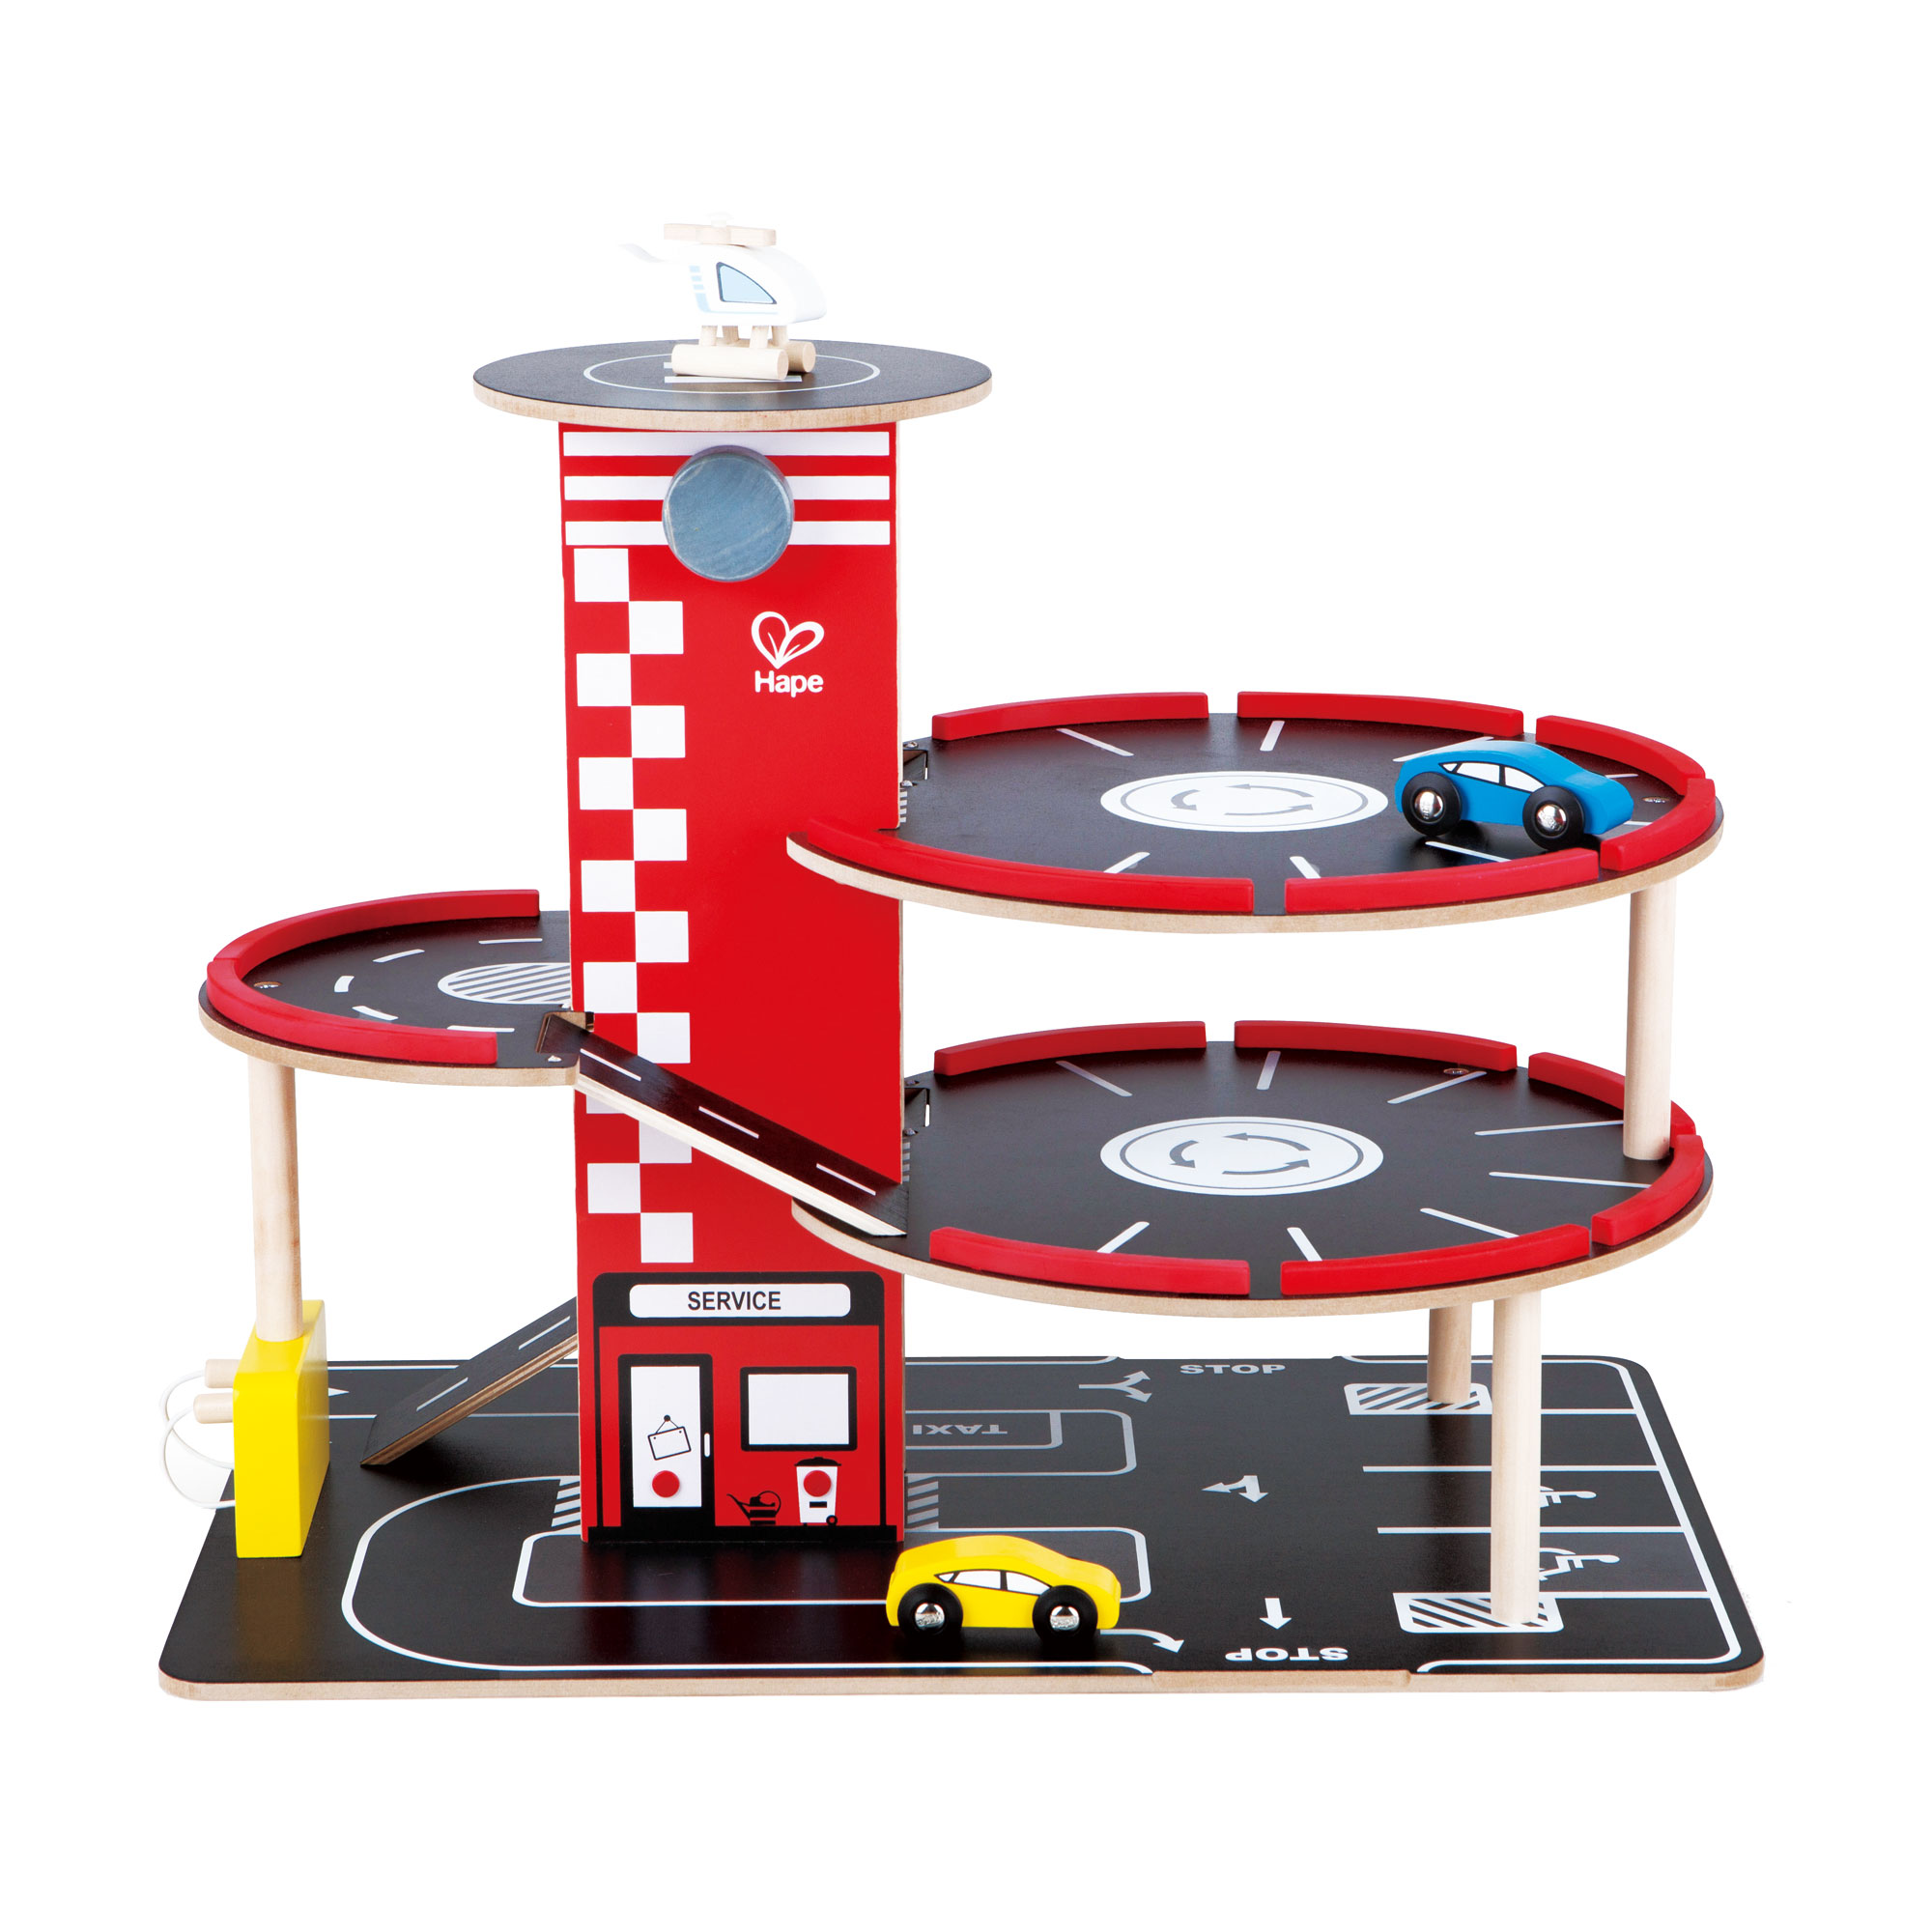 Hape Toddler Wooden Toy Play Set RaceAround Parking Garage